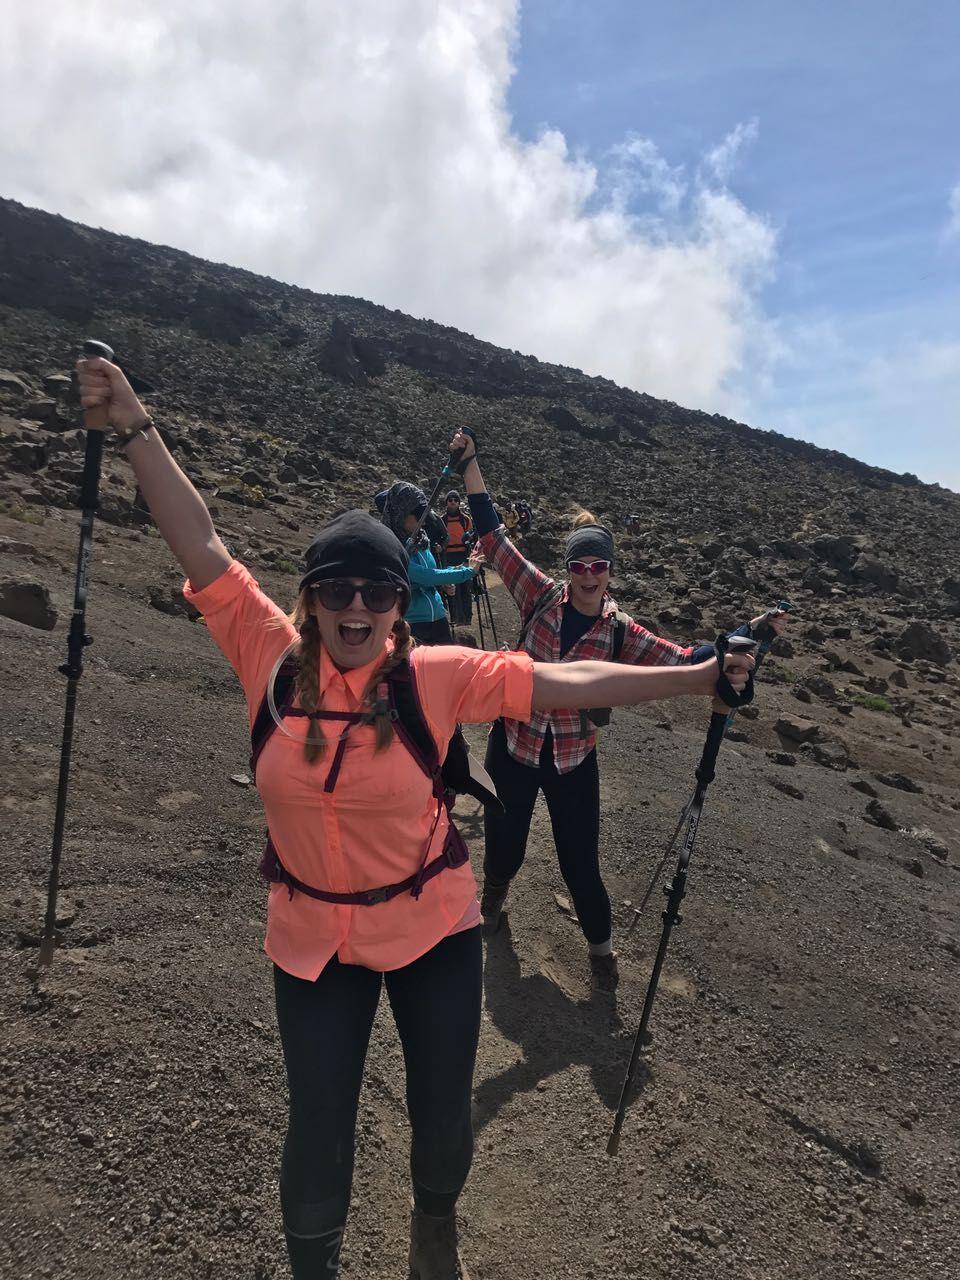 Experience the desolate beauty of Kilimanjaro's <br> unique lunar landscape.